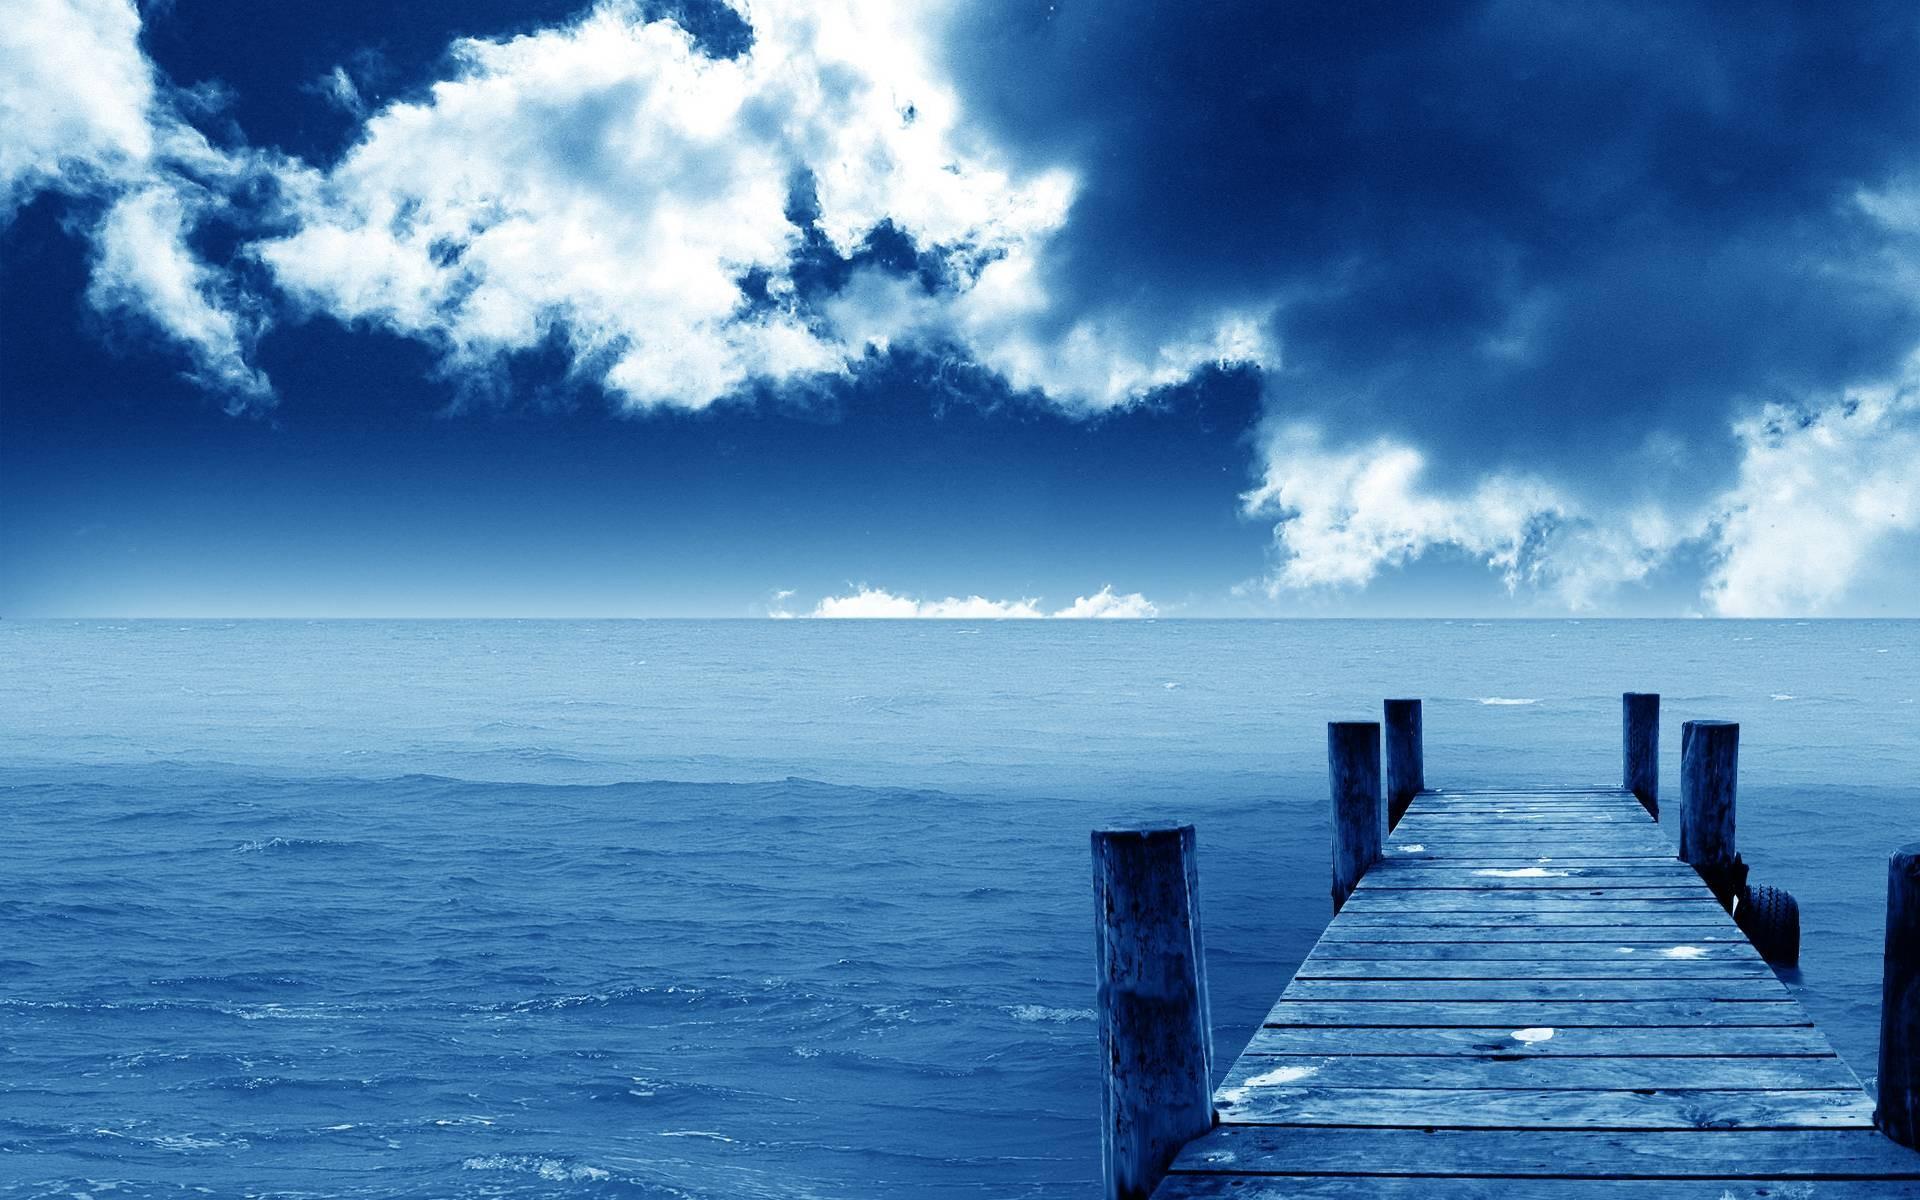 Wallpaper : sinar matahari, laut, pantai, refleksi, langit, awan